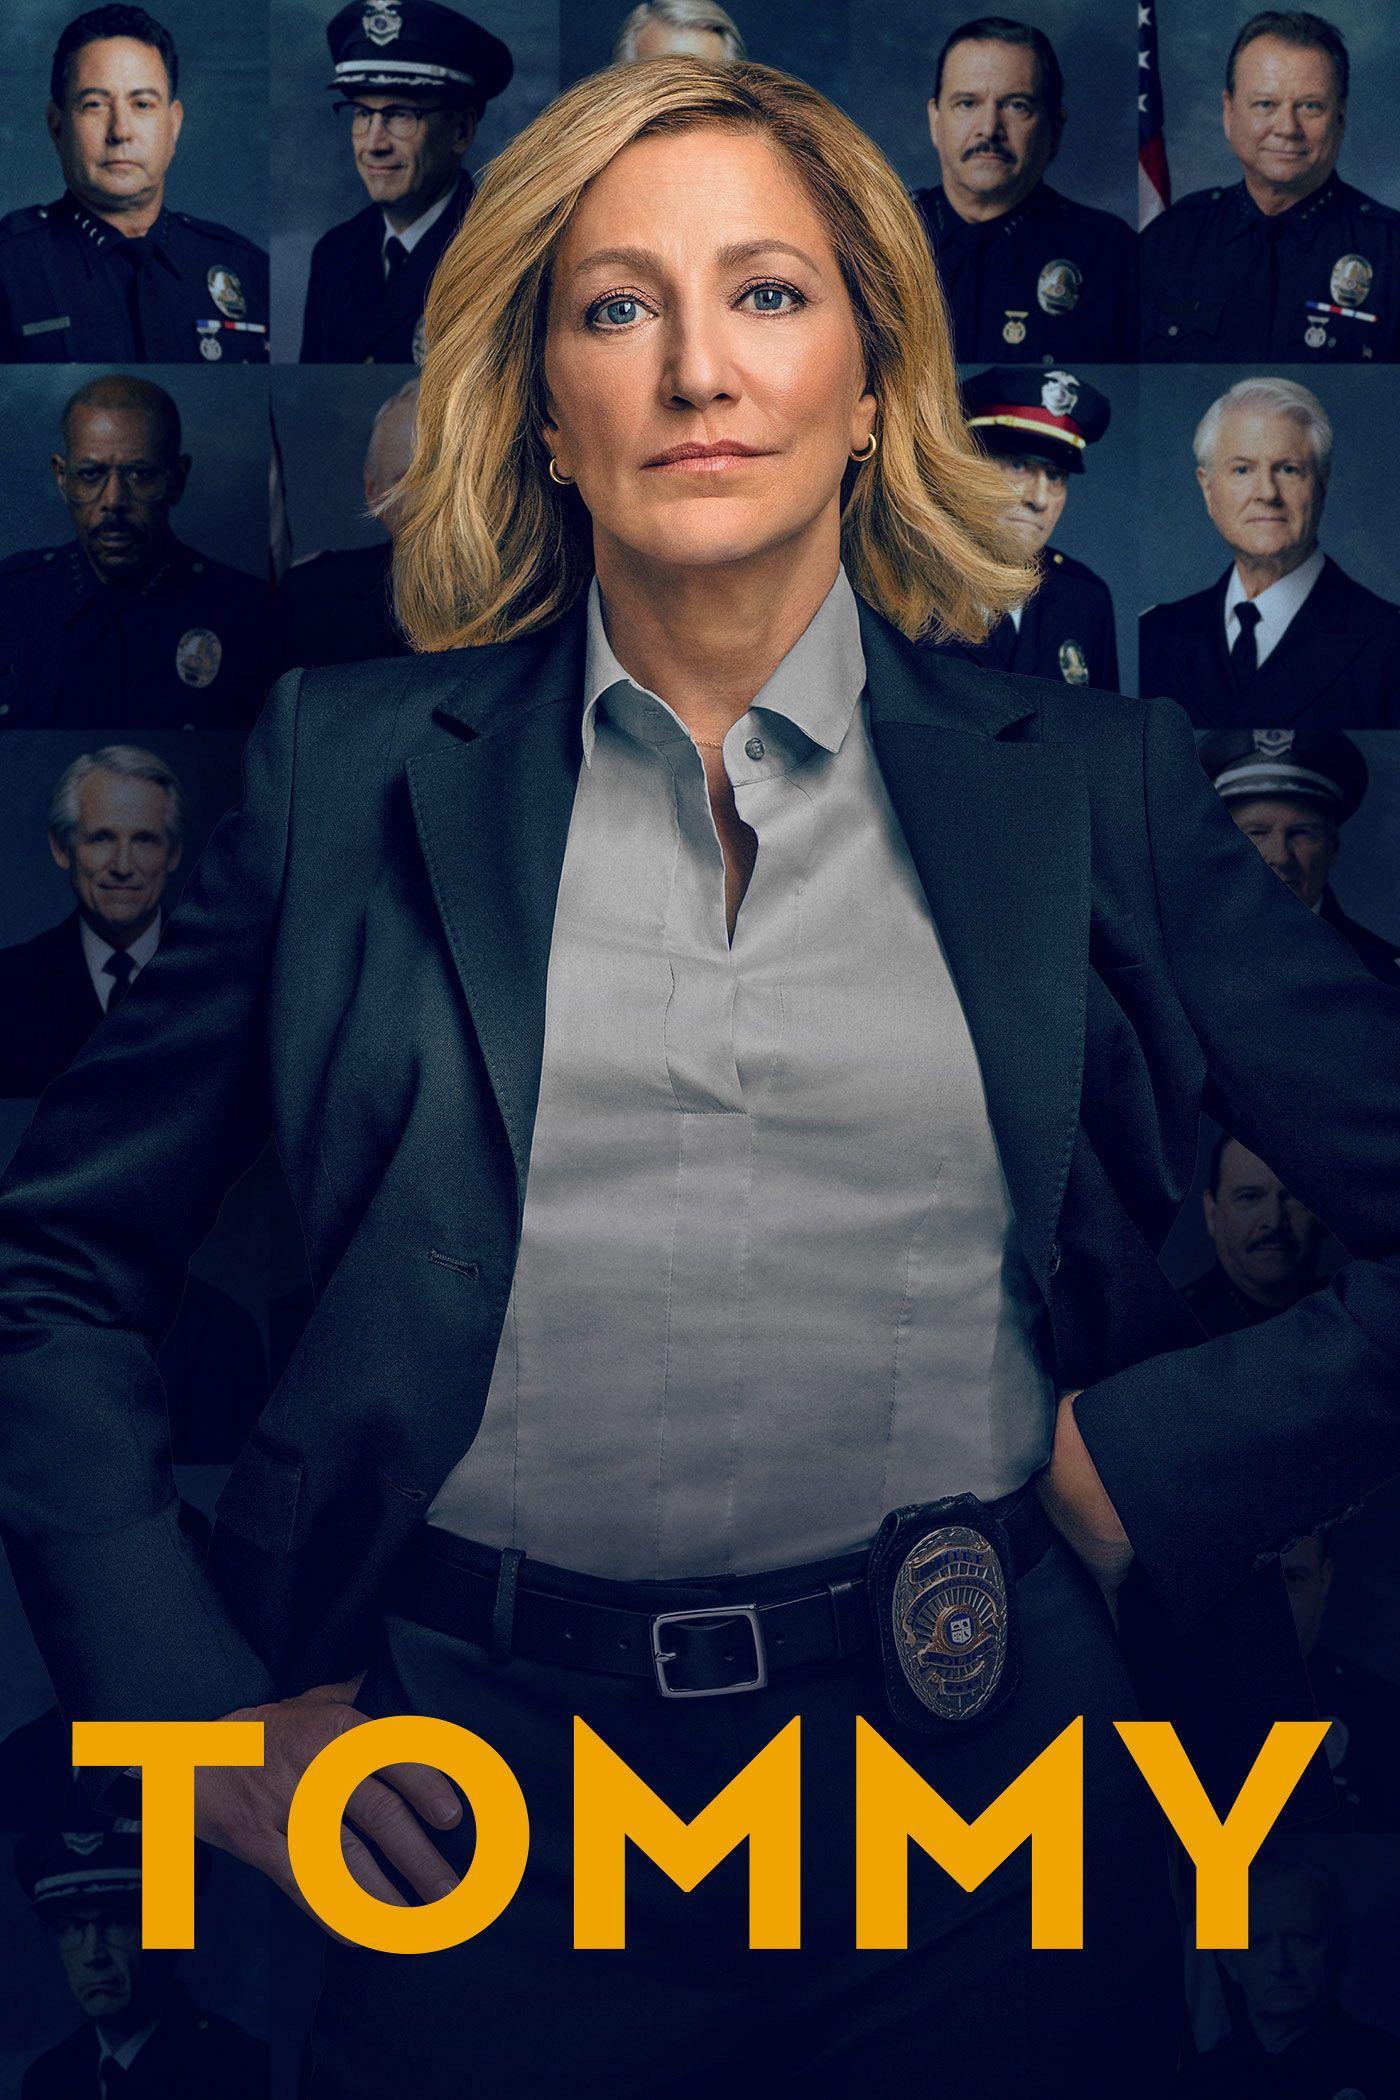 Tommy 2020 Season 1 Episode 2 123movies Tommy Season 1 Episode